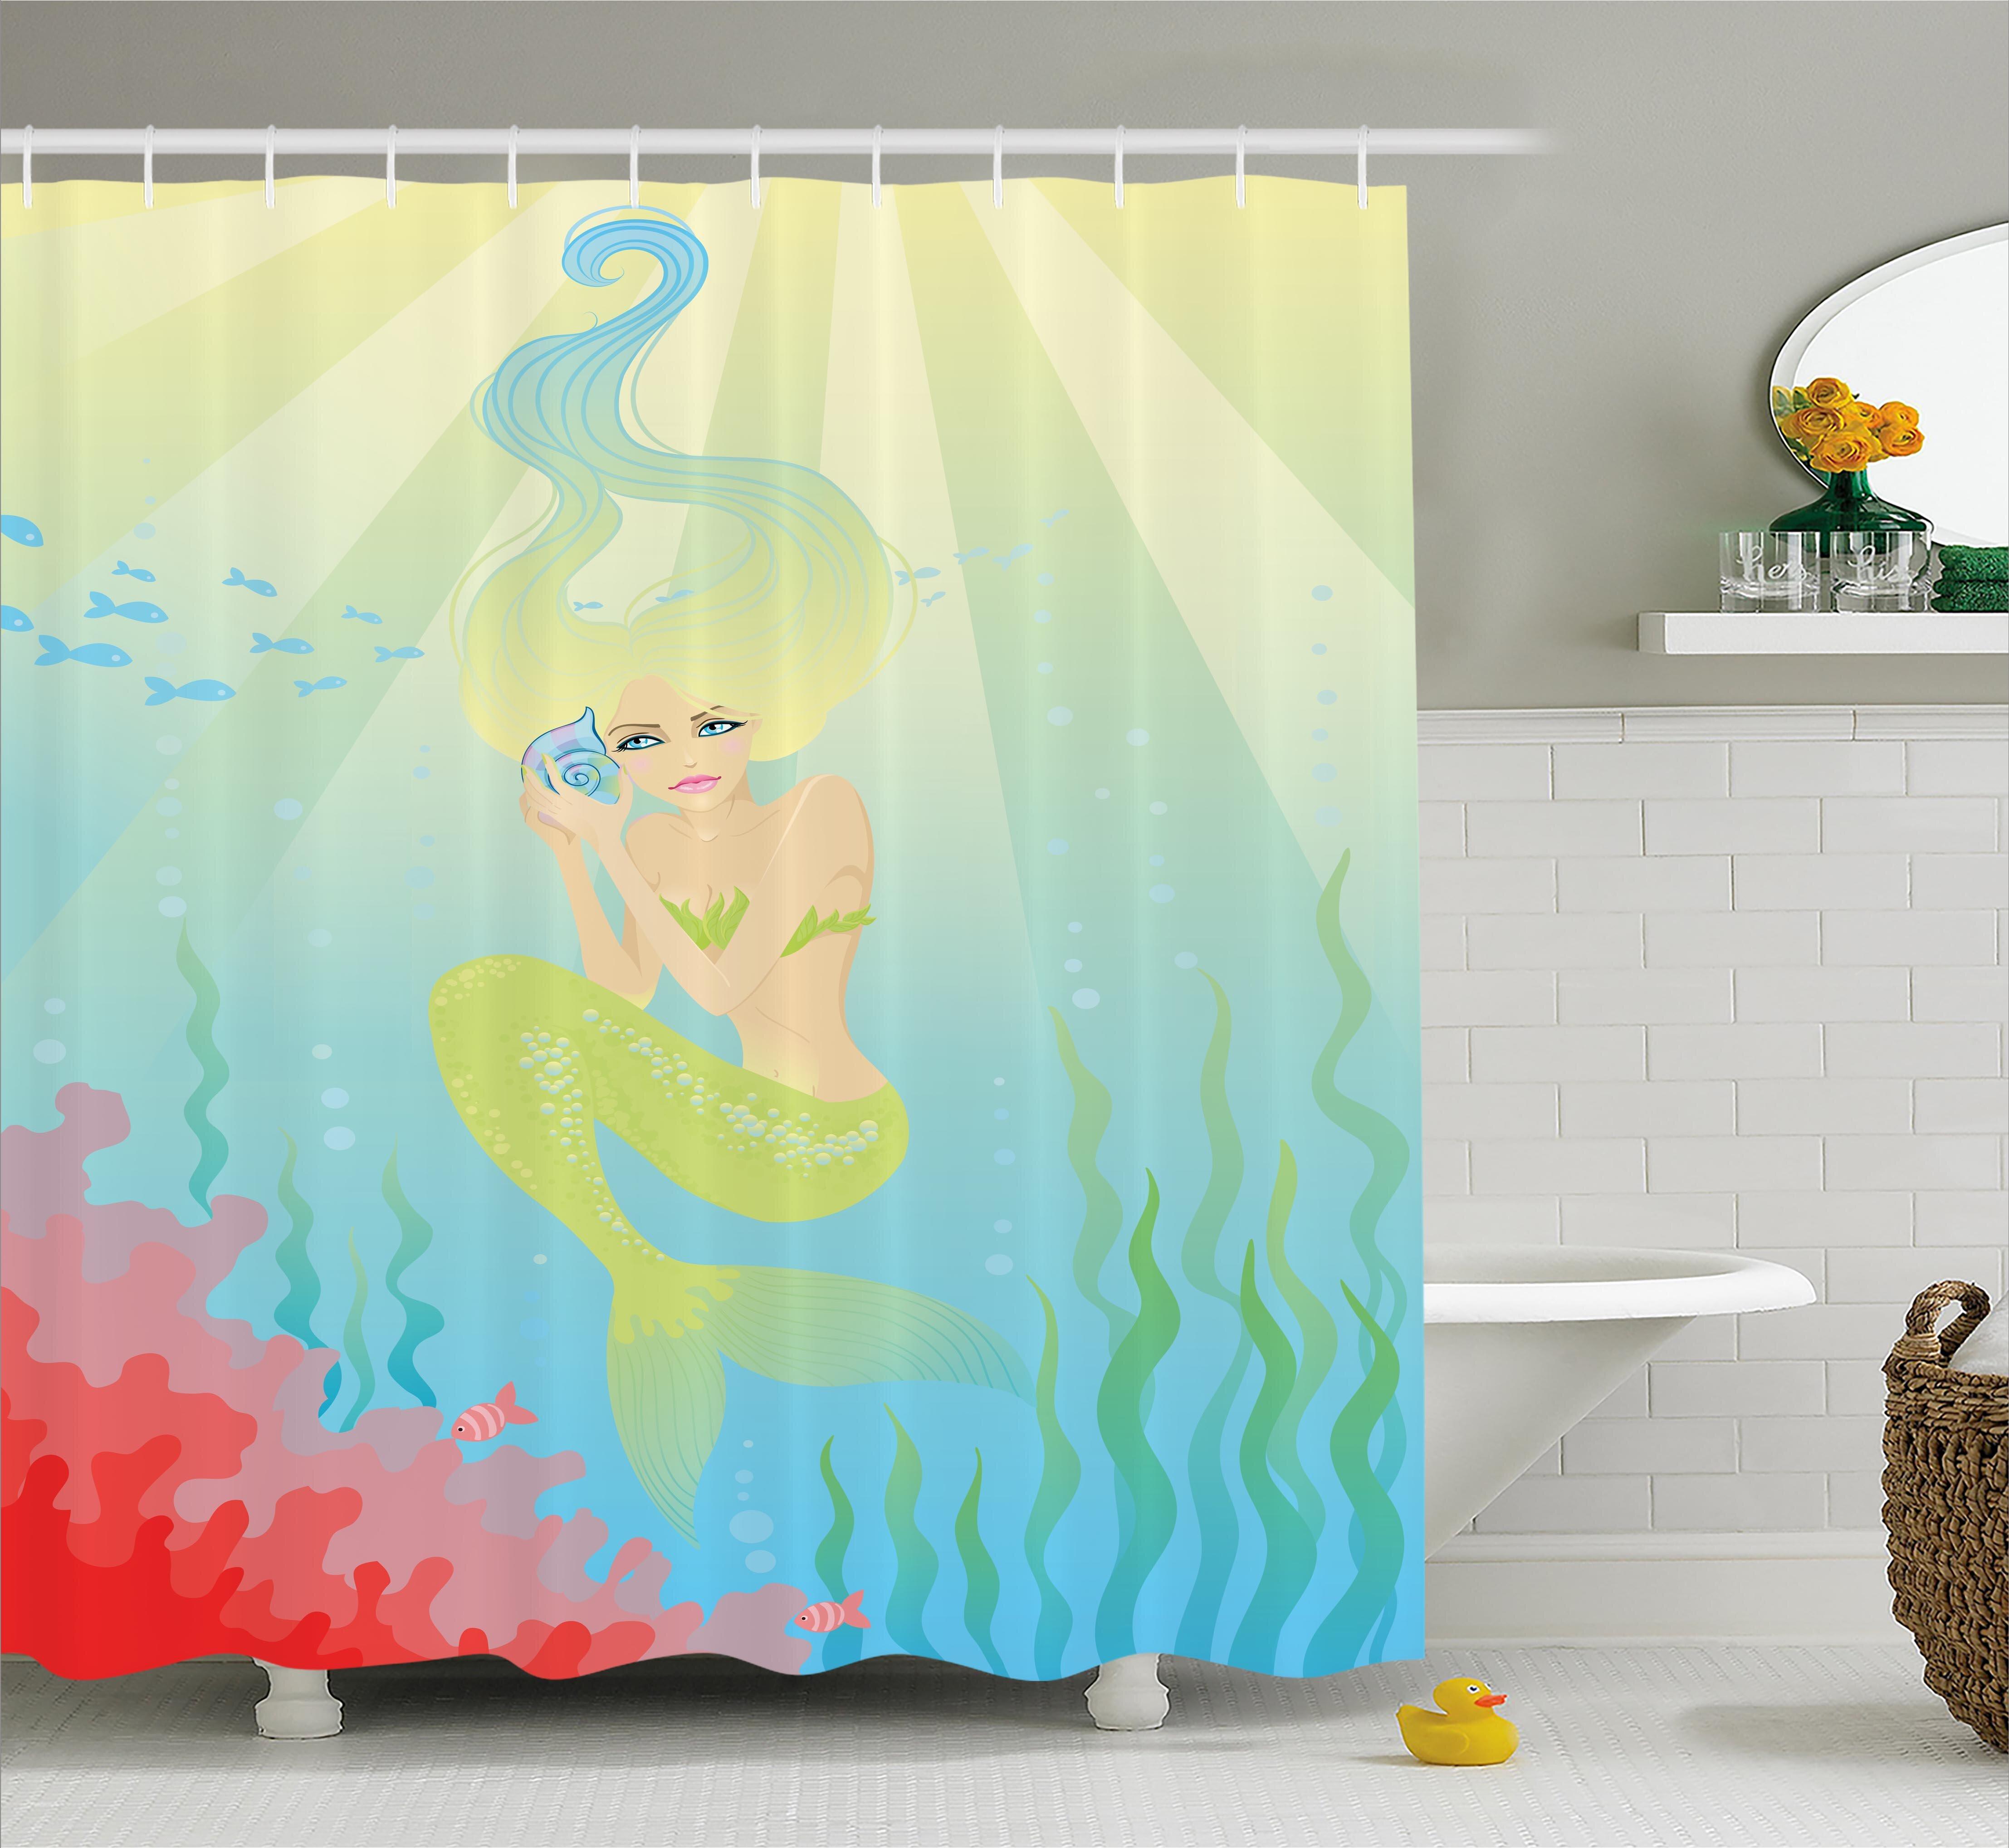 East Urban Home Ocean Unusual Mermaid Shell Shower Curtain